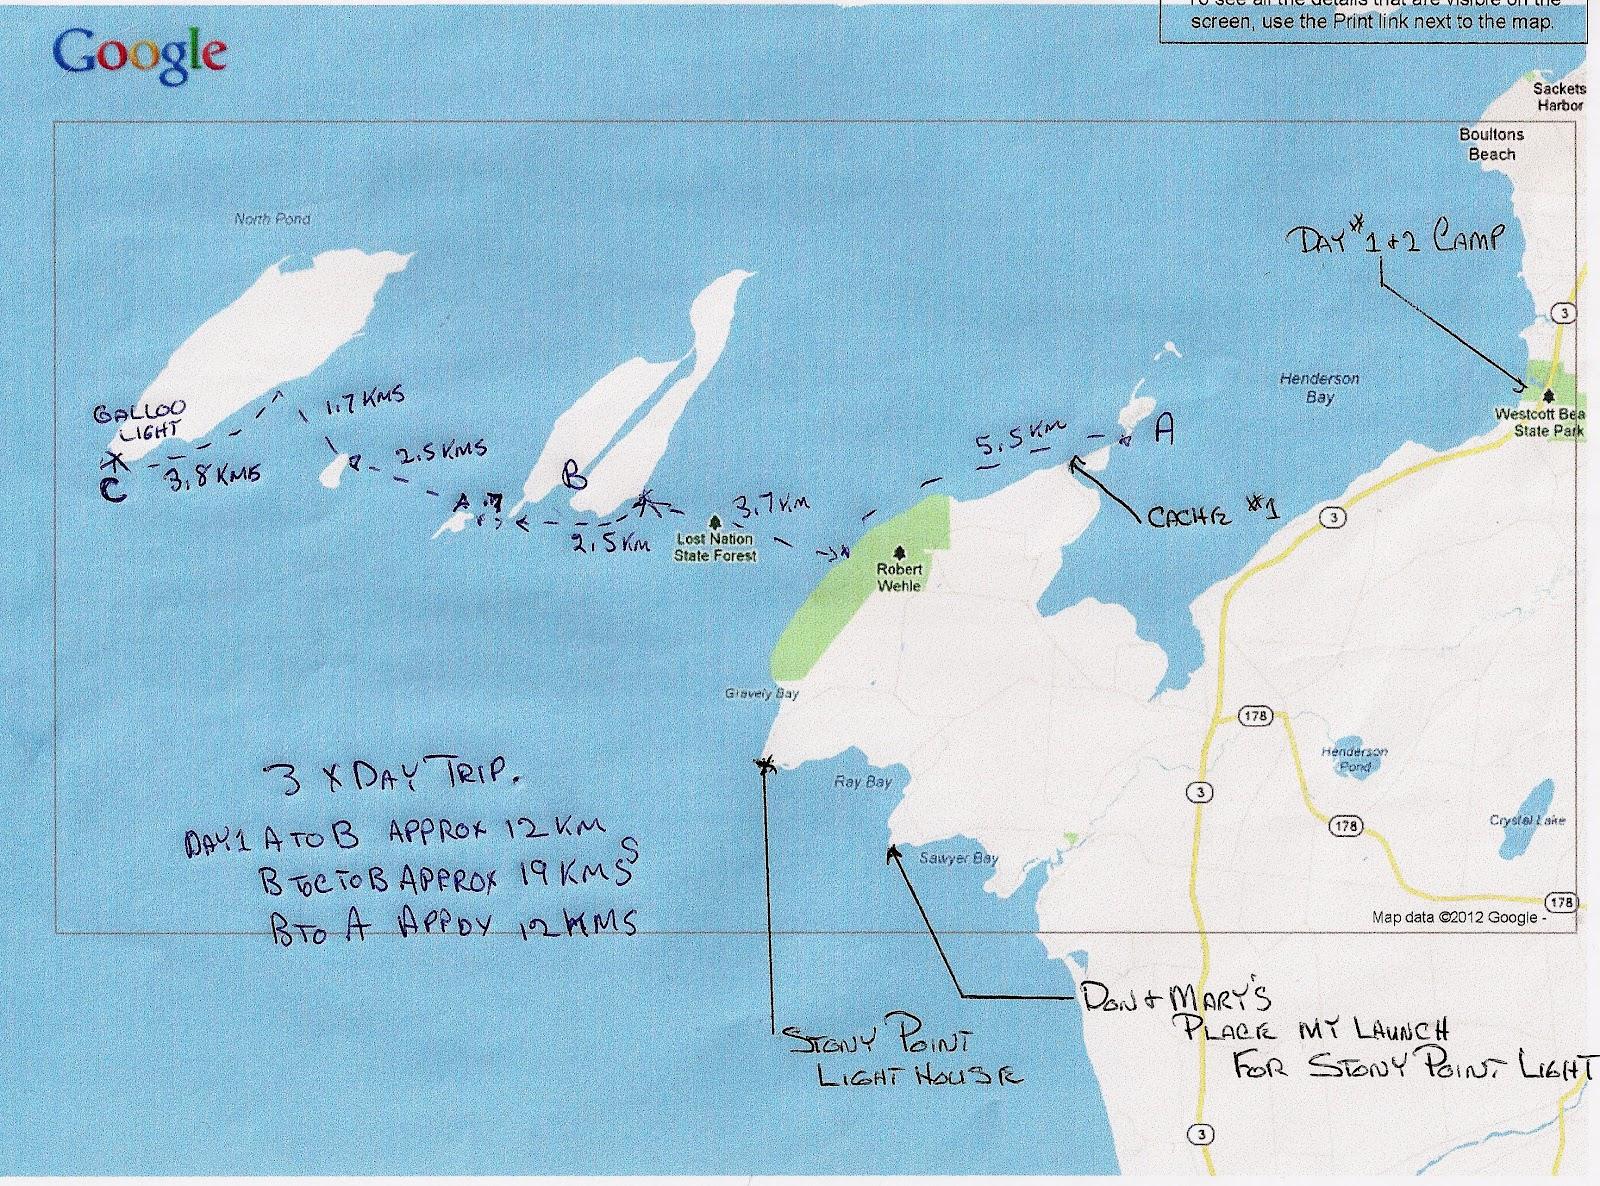 a koa camp launch point b stoney island c galloo lighthouse